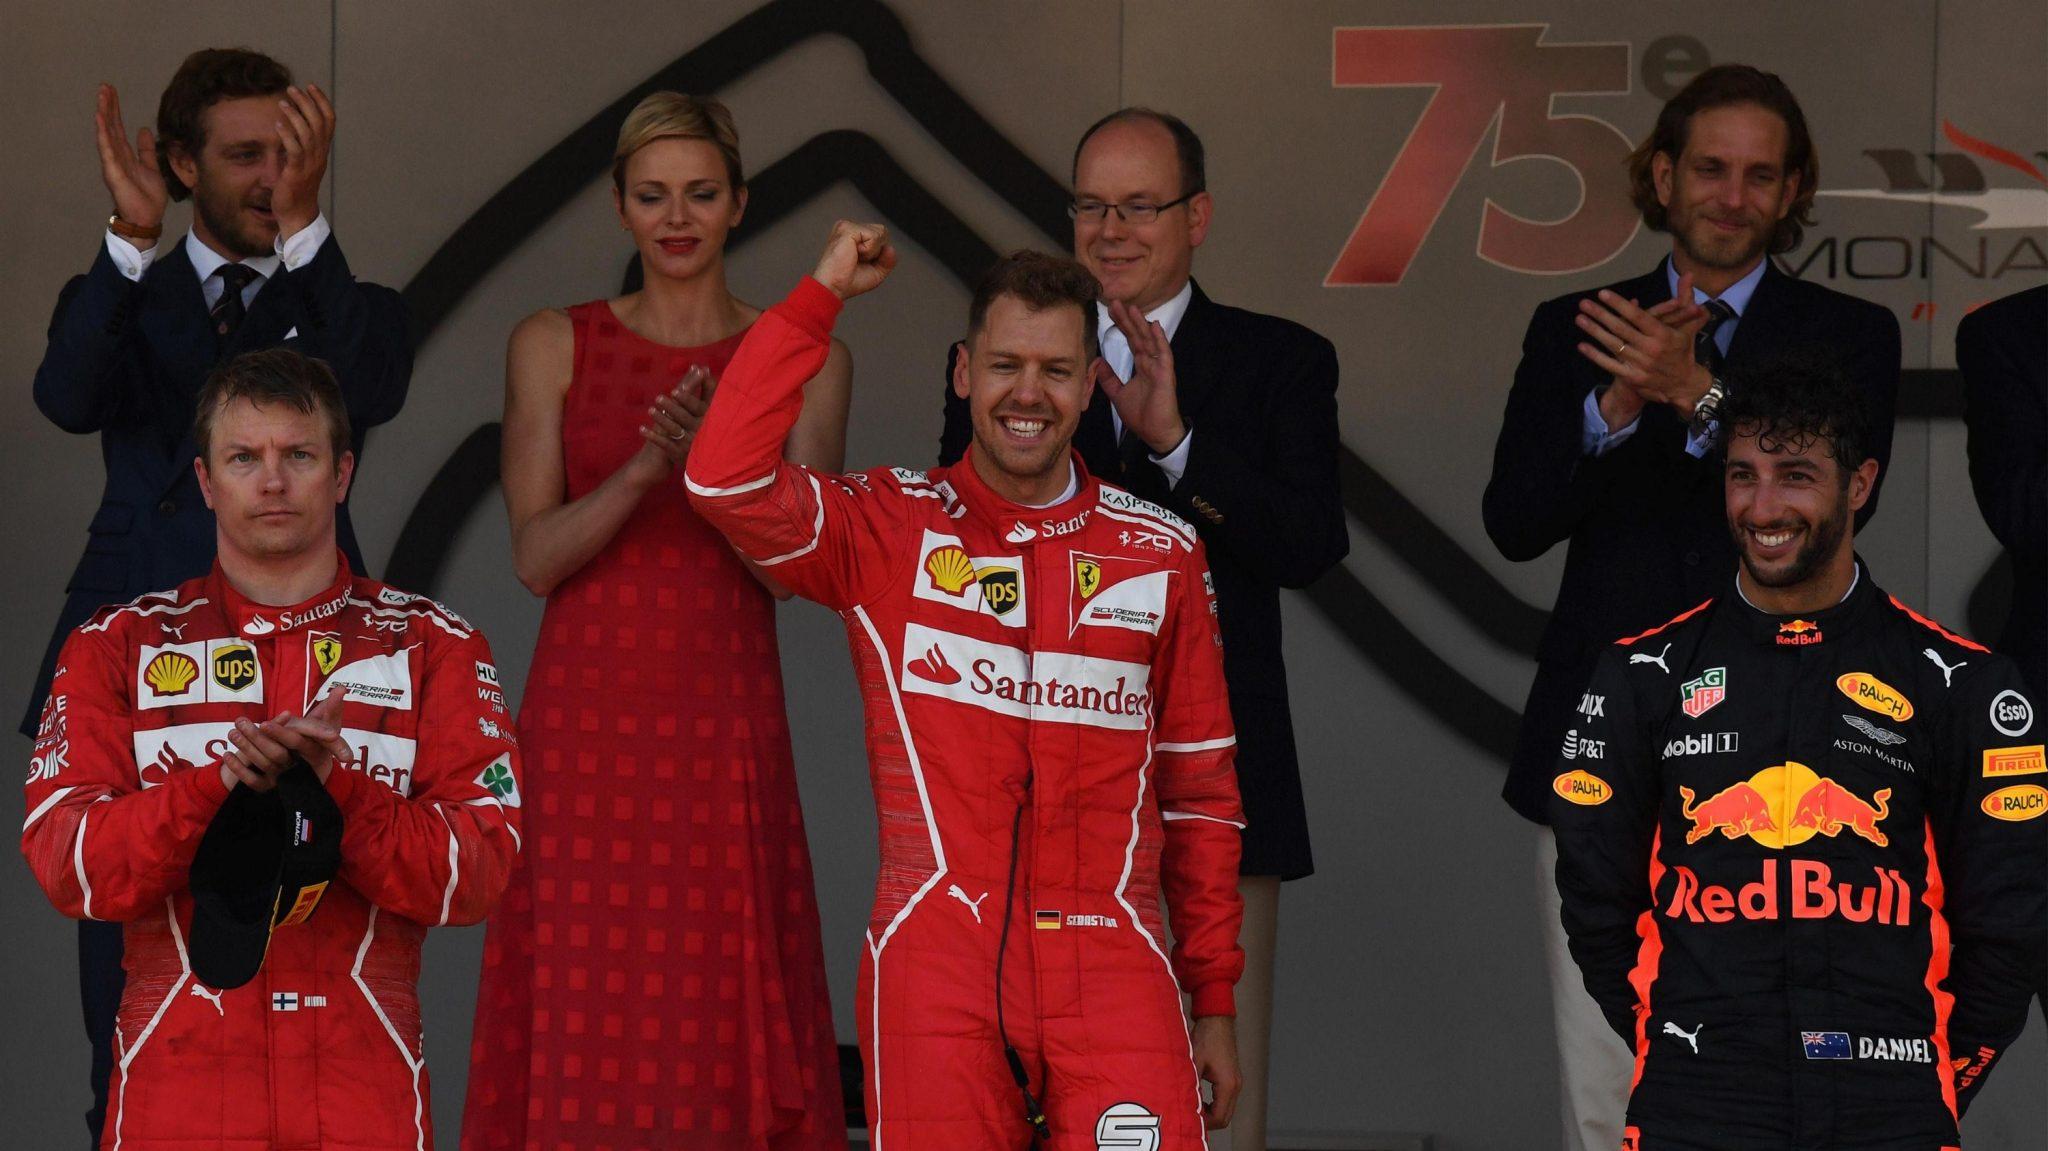 (L to R) Kimi Raikkoneni, Sebastian Vettel, and Daniel Ricciardo on podium at 75th Monaco Grand Prix Monaco Grand Prix, Sunday 28 May 2017. © Sutton Images